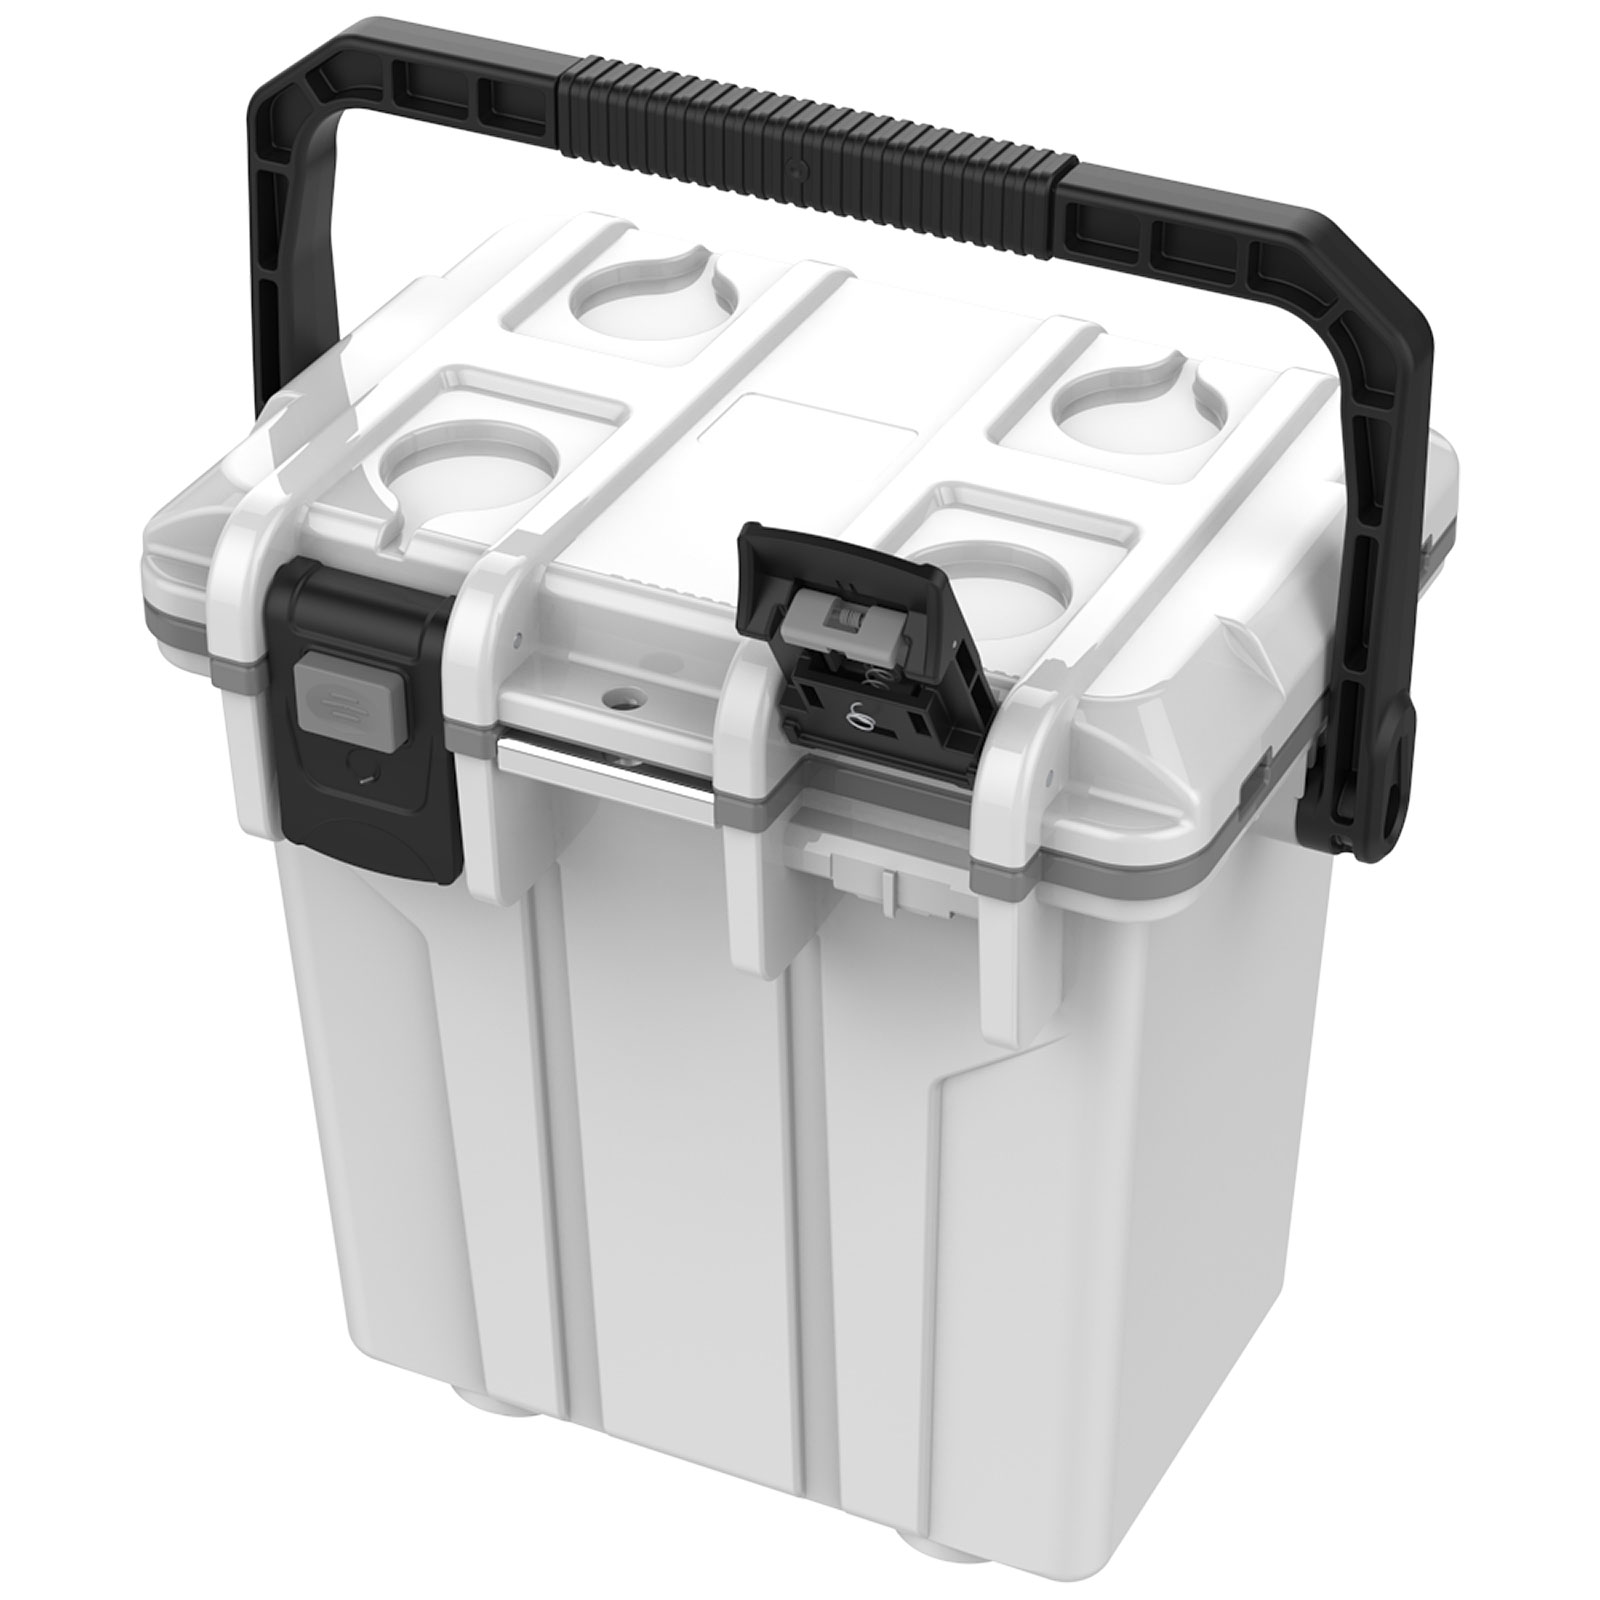 Tsunami Kühlbox 20 Quart Cooler Box 20 Liter 20 l - Weiß COB20 WHITE